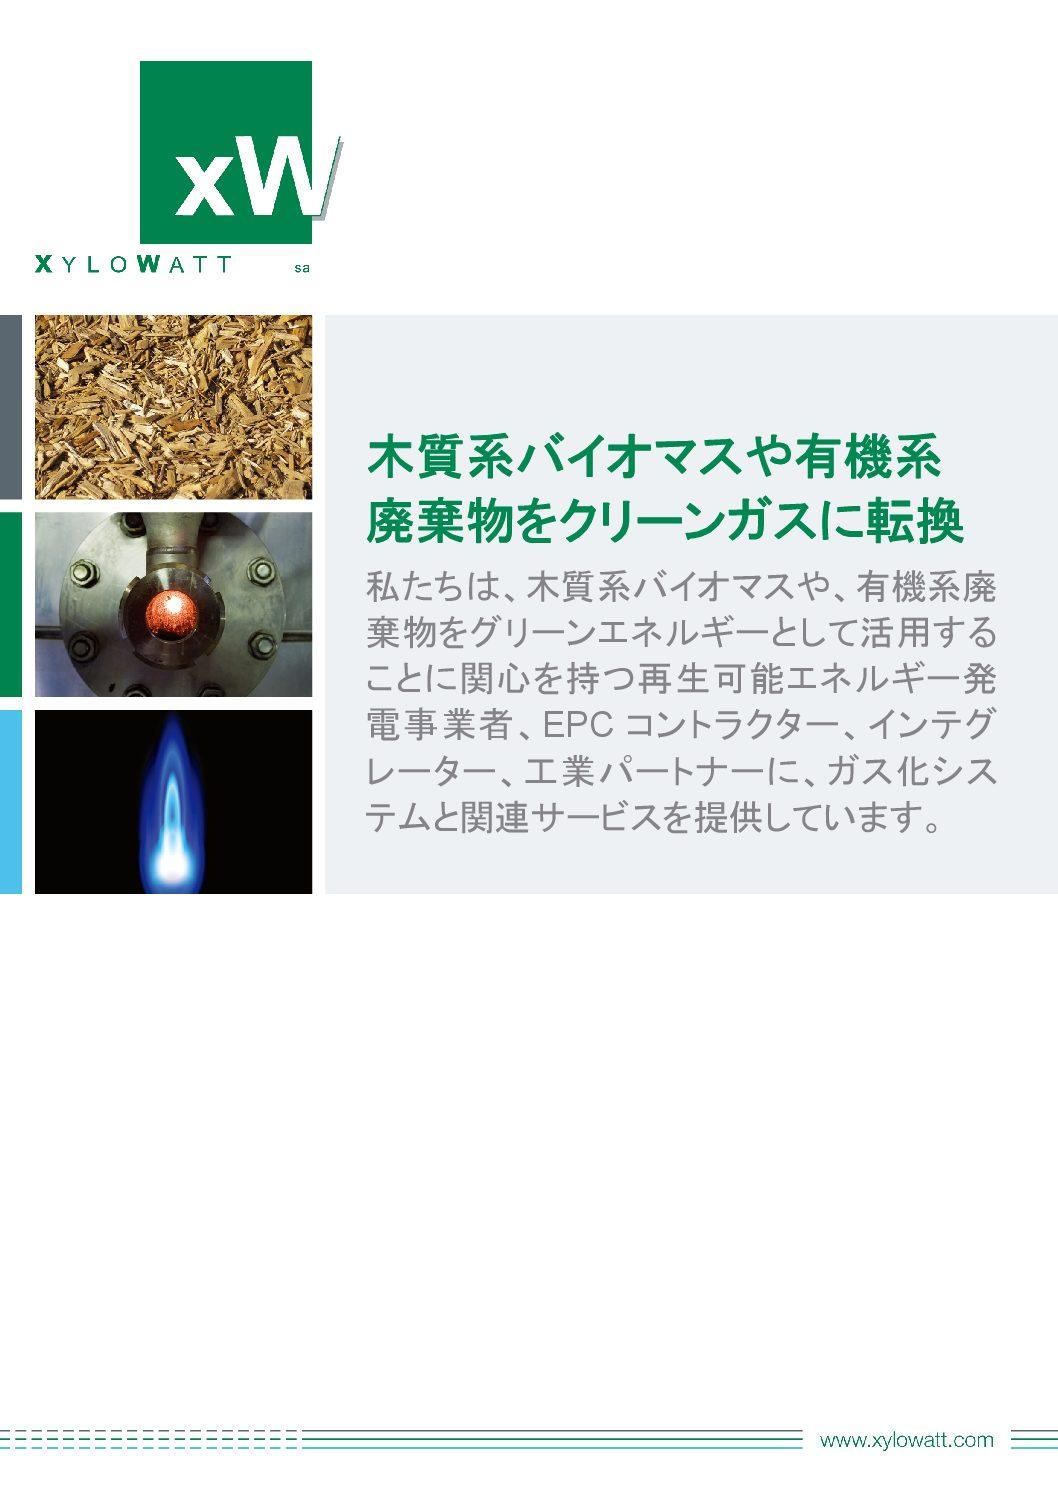 Xylowatt_Leaflet_ Processing_of_ radioactive_Cesium_contaminated_